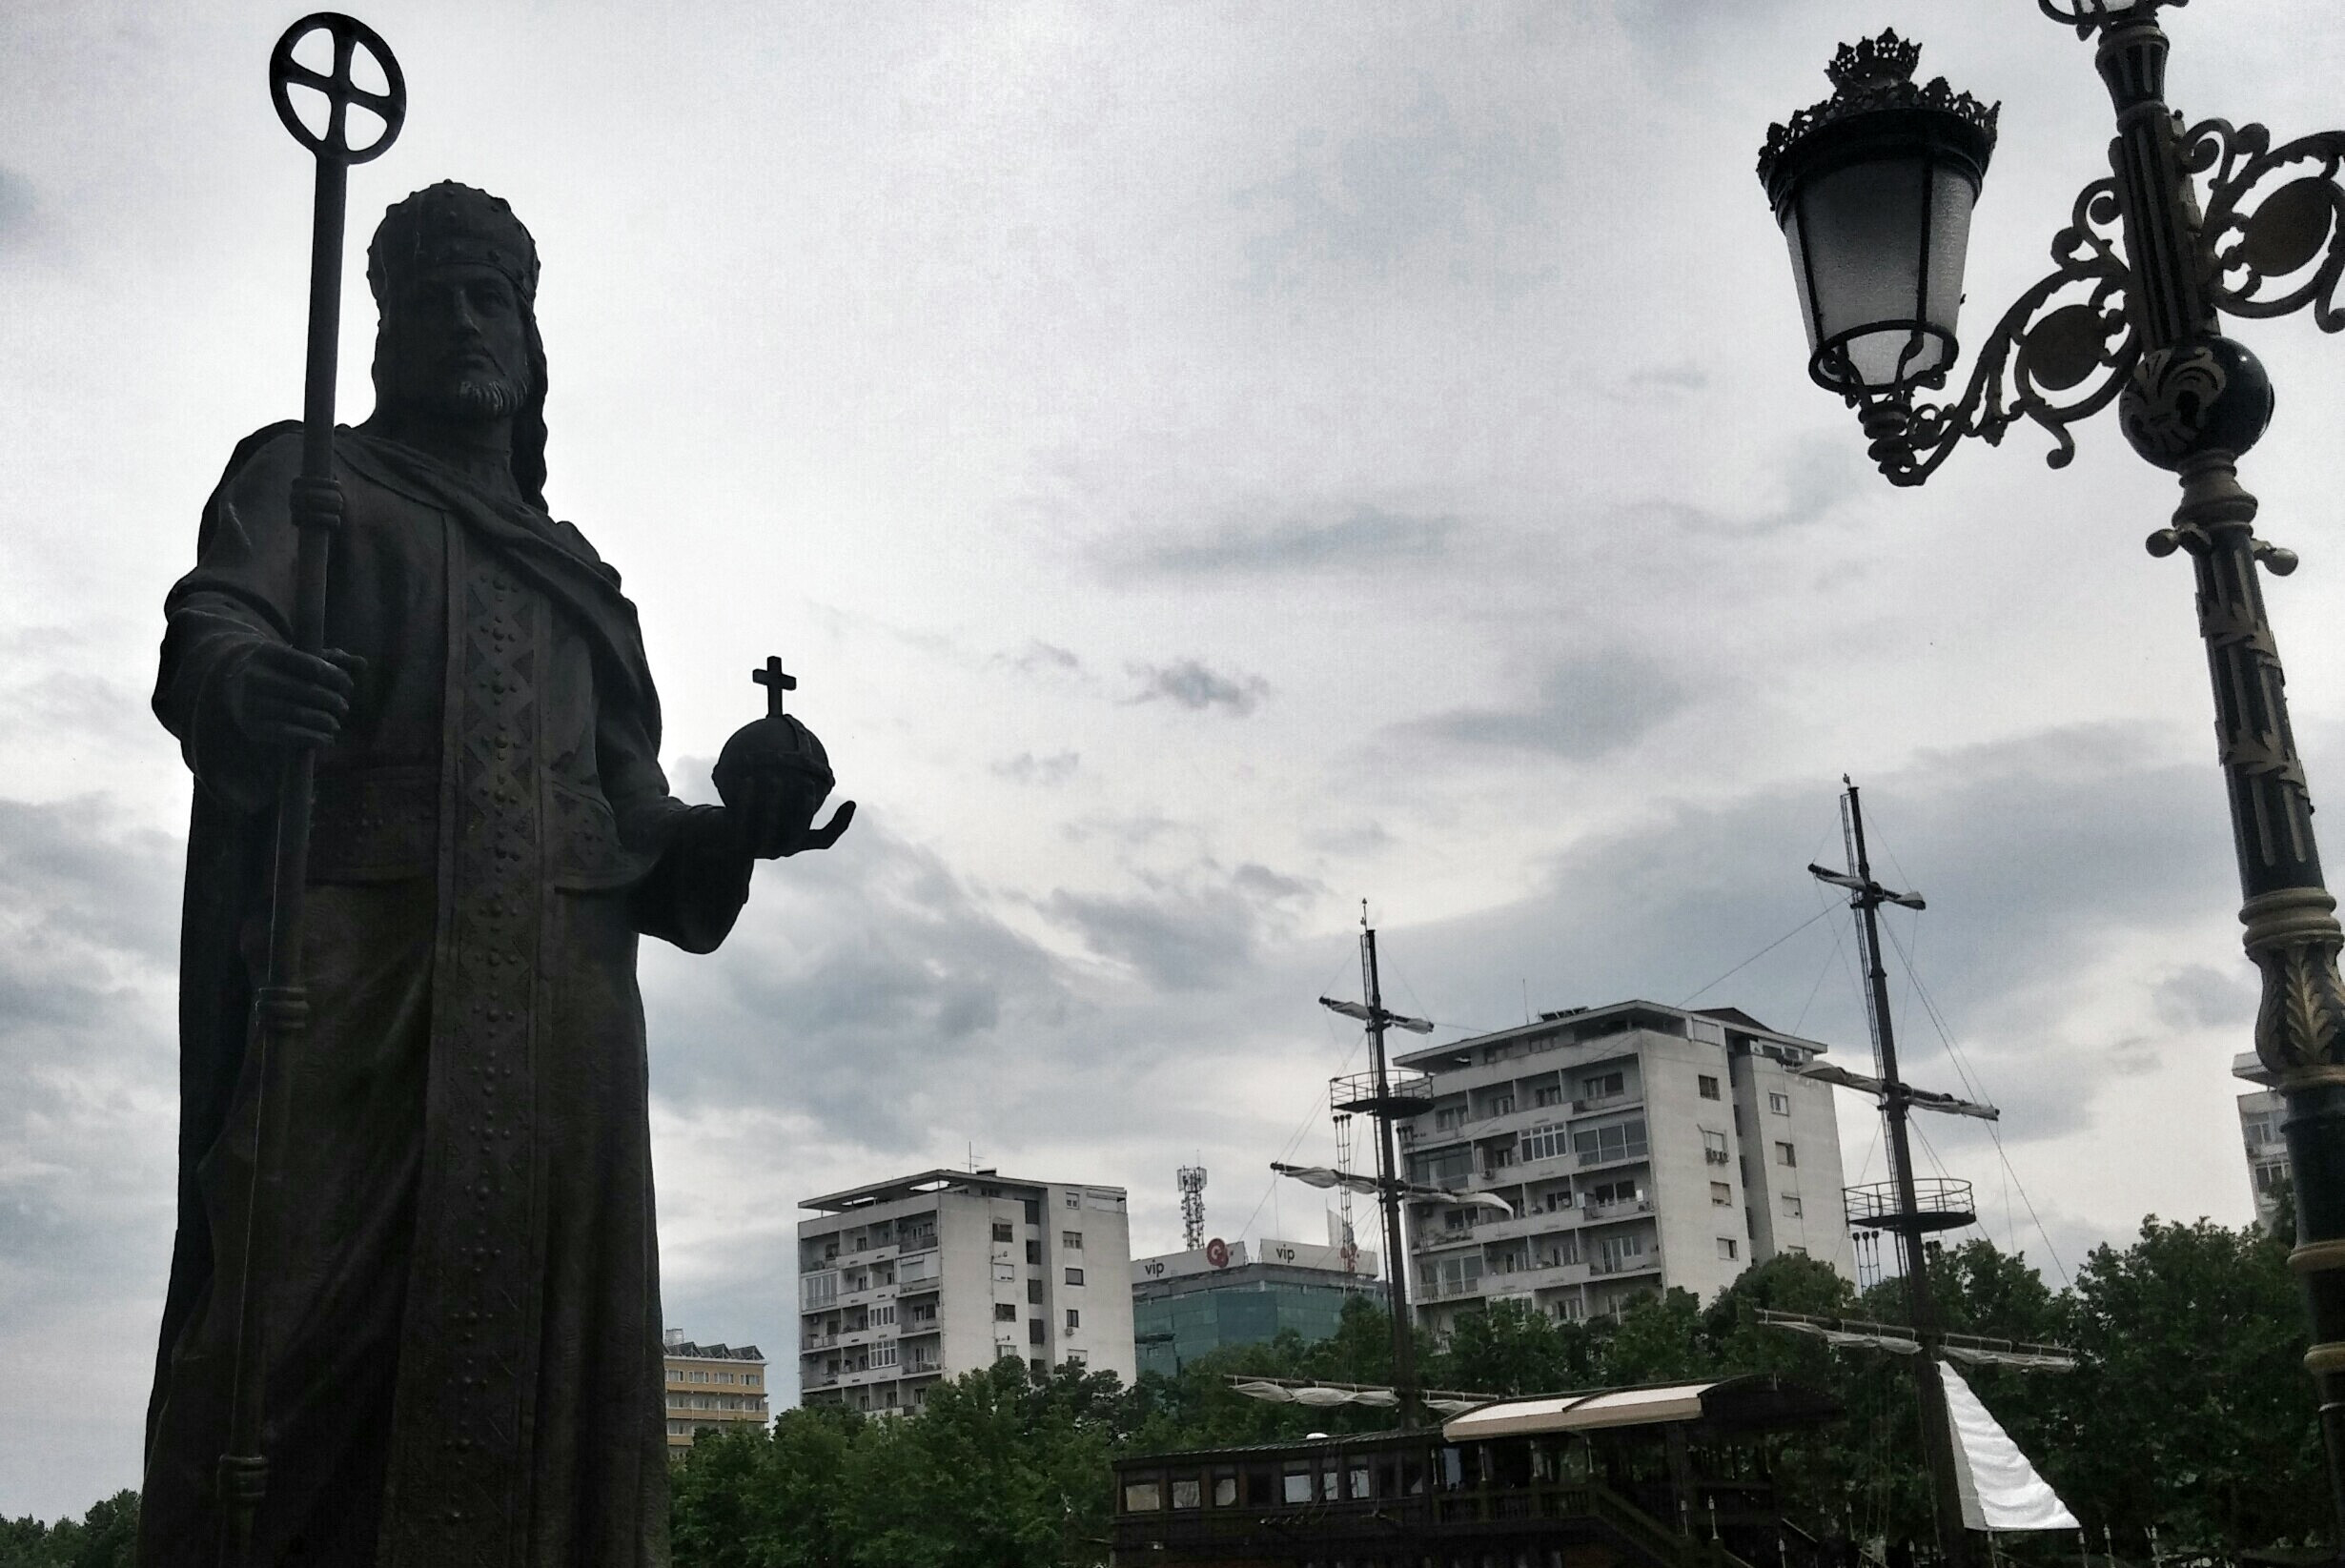 Споменик цару Душану у Скопљу (Фото: ekonomskevesti.com)